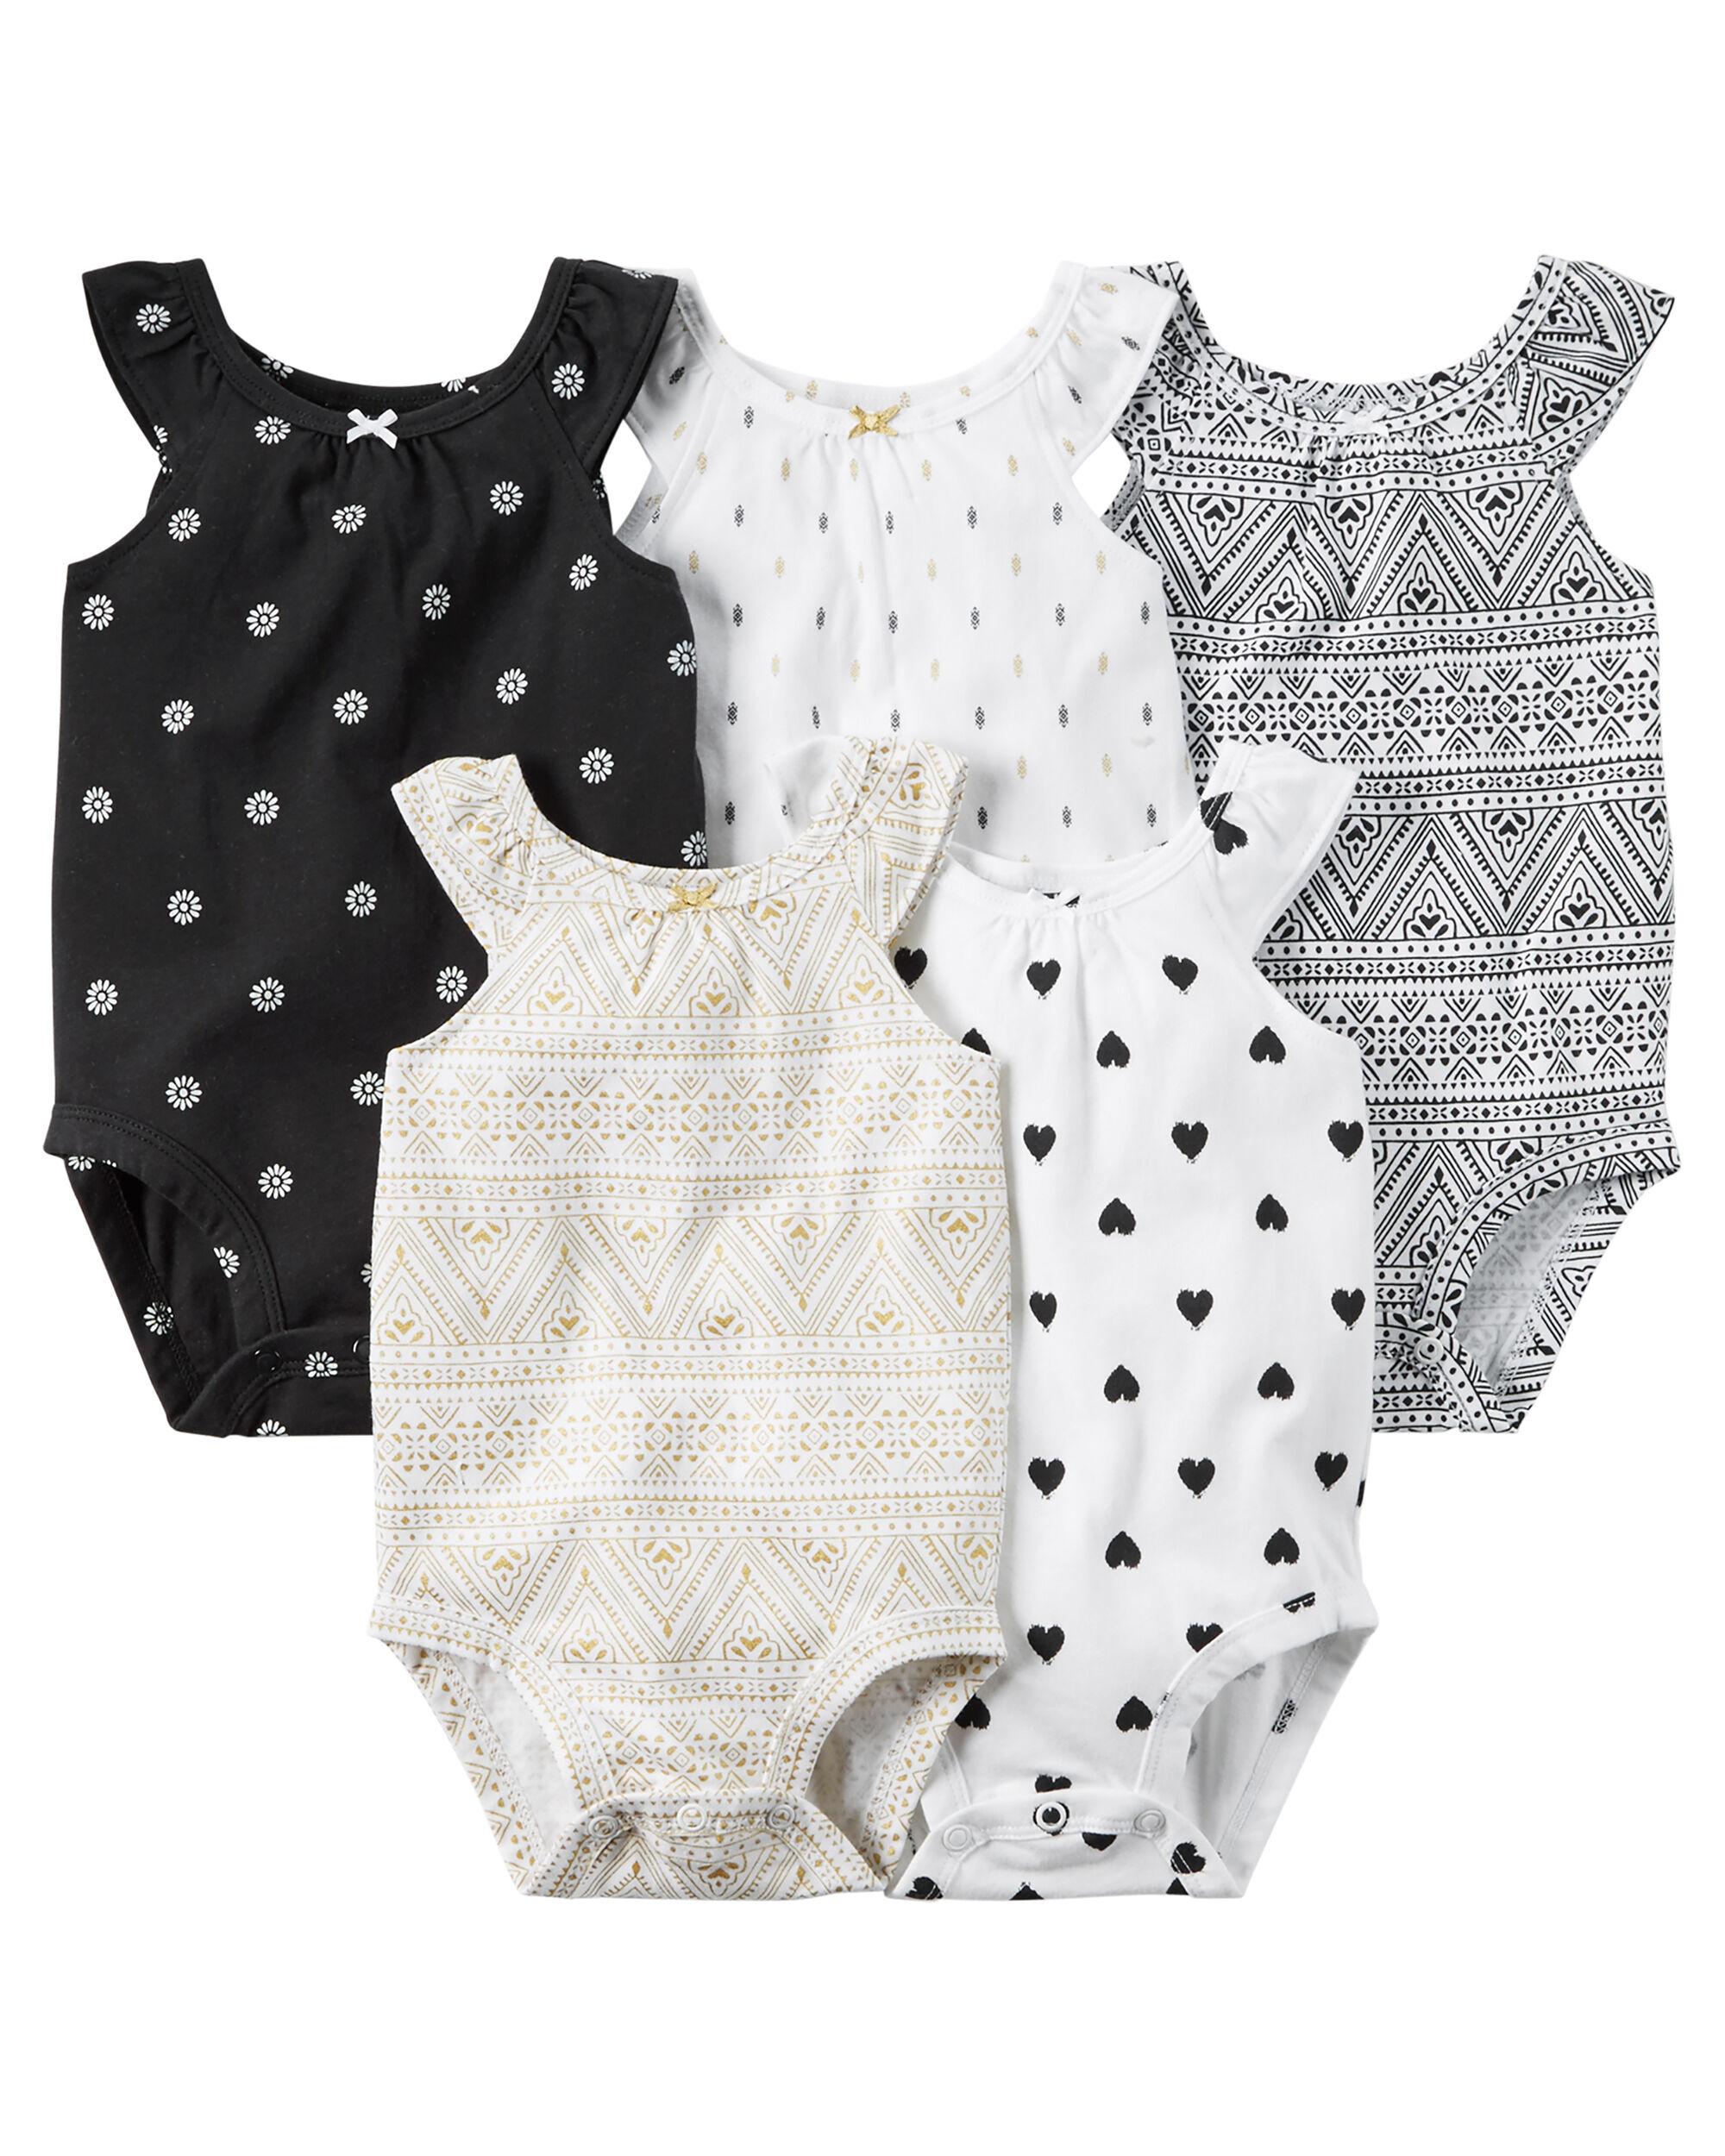 5 Pack Sleeveless Bodysuits